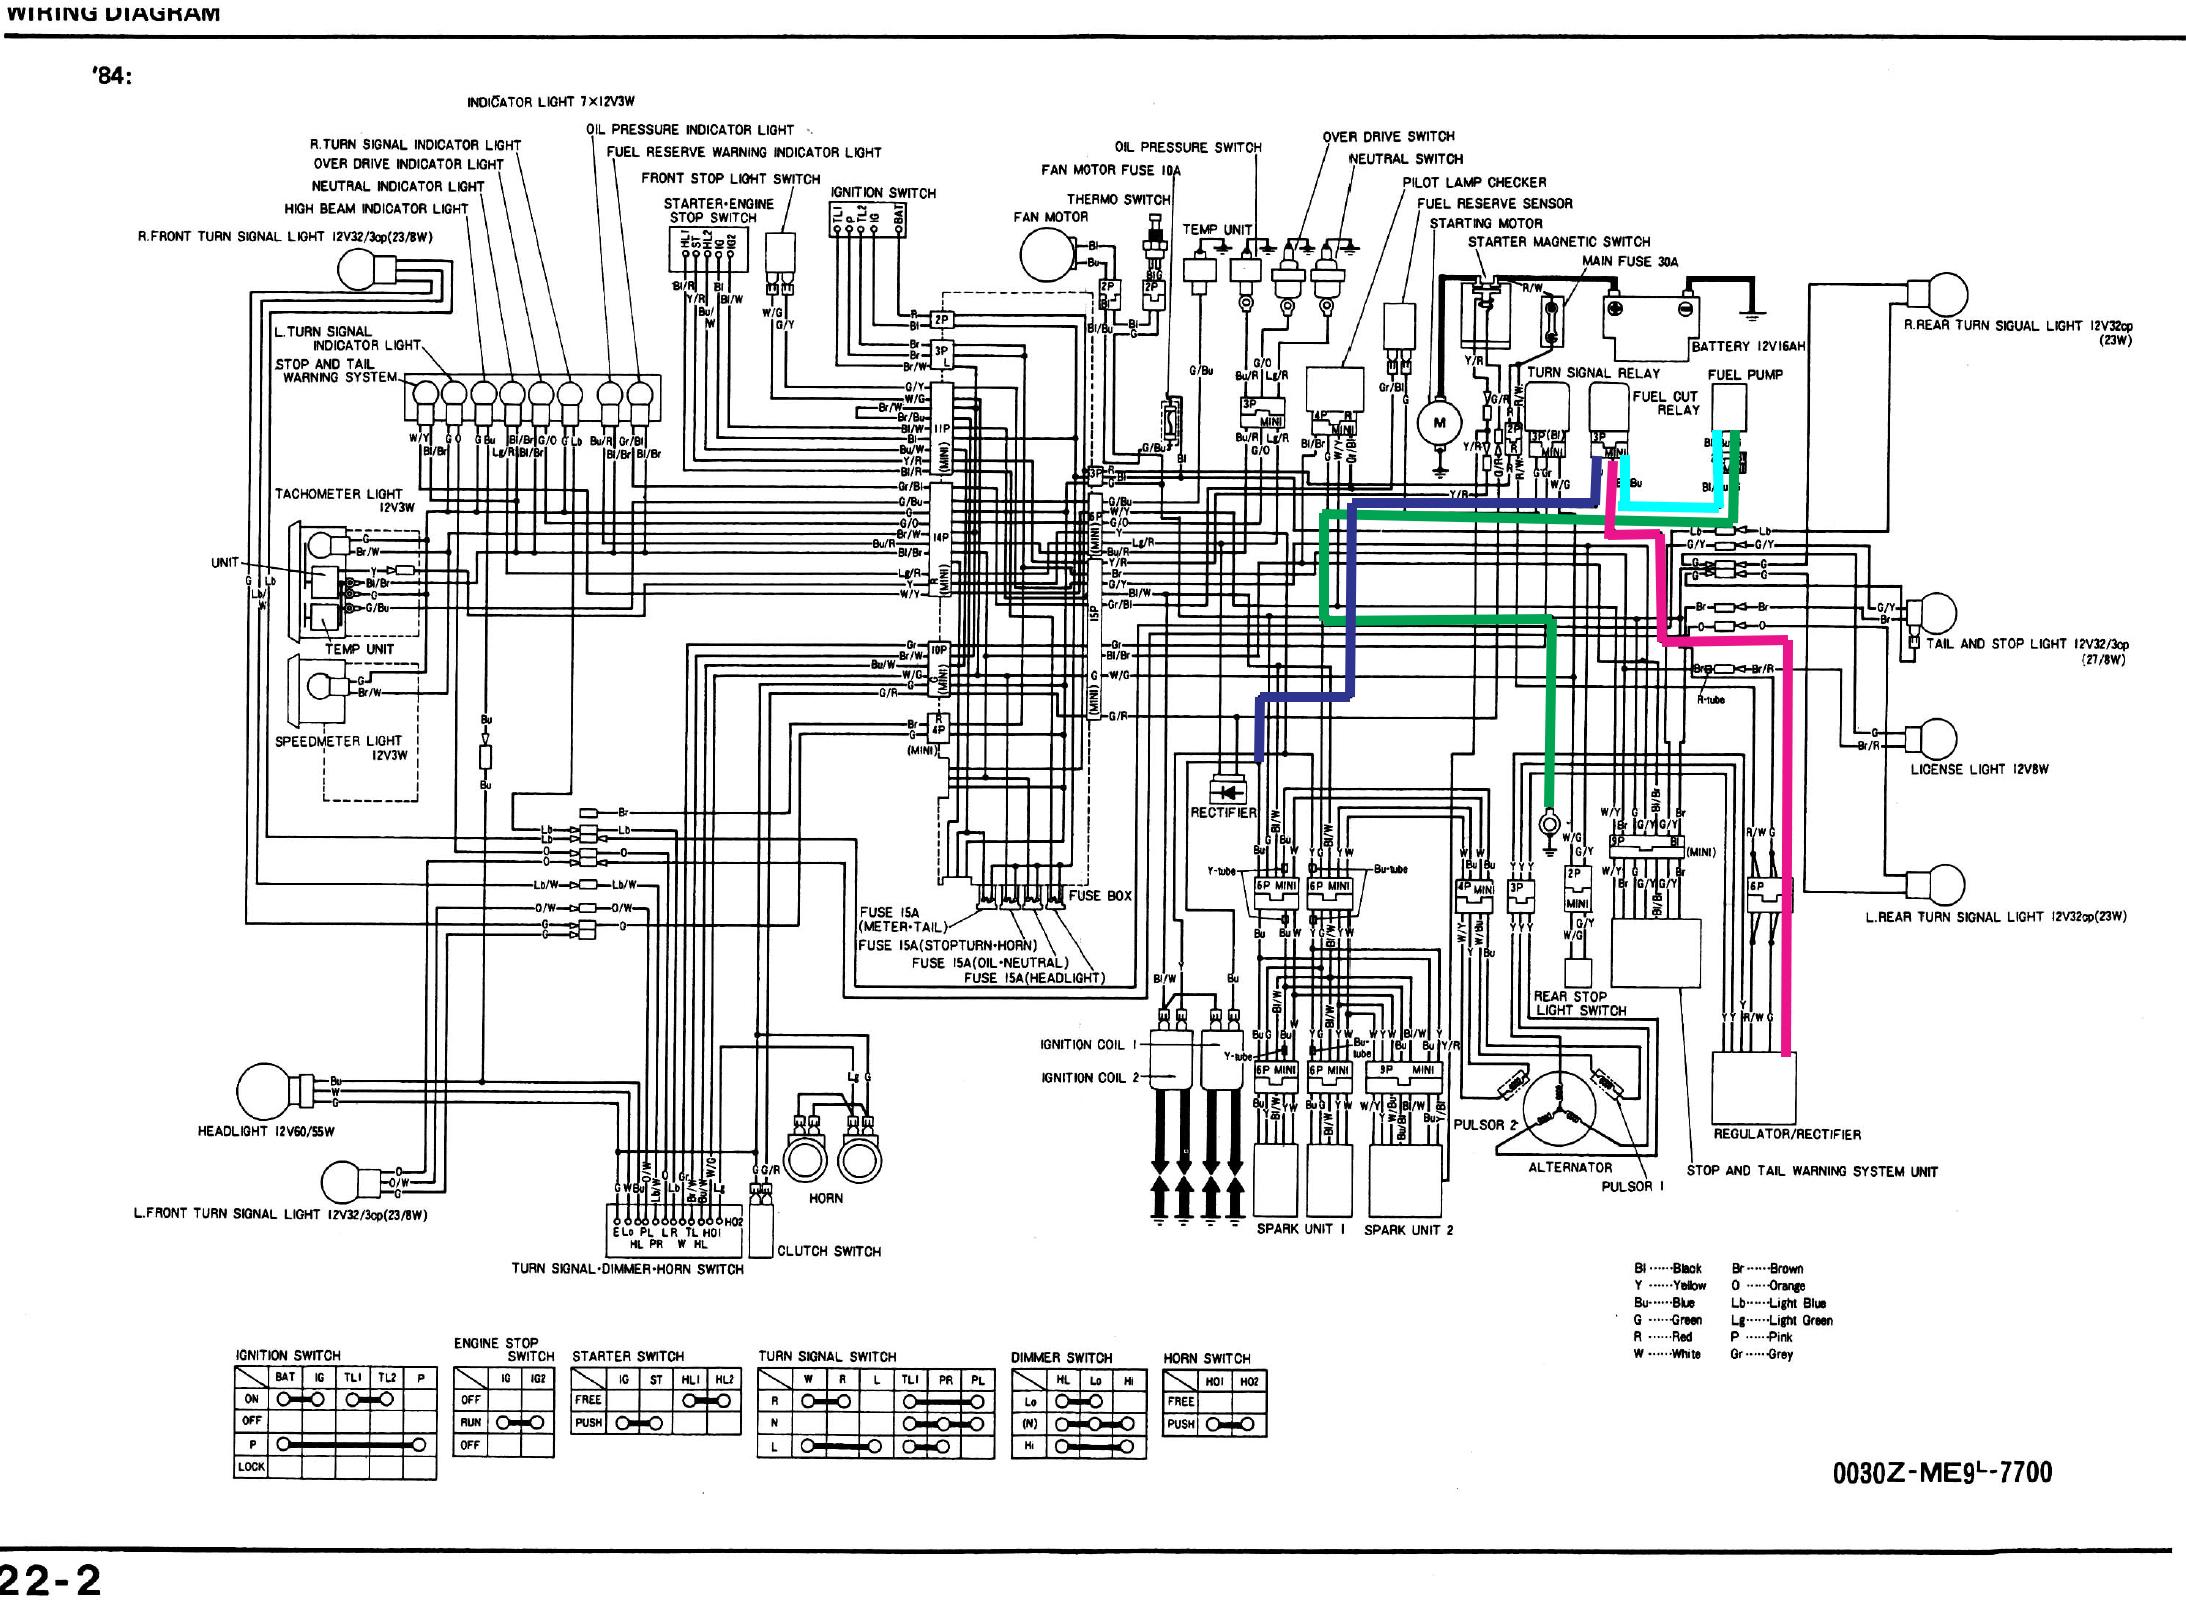 1984 honda shadow 700 wiring diagram 4k wallpapers design rh wikidesign us Honda Motorcycles Schematics Honda 750 Spirit Modifications